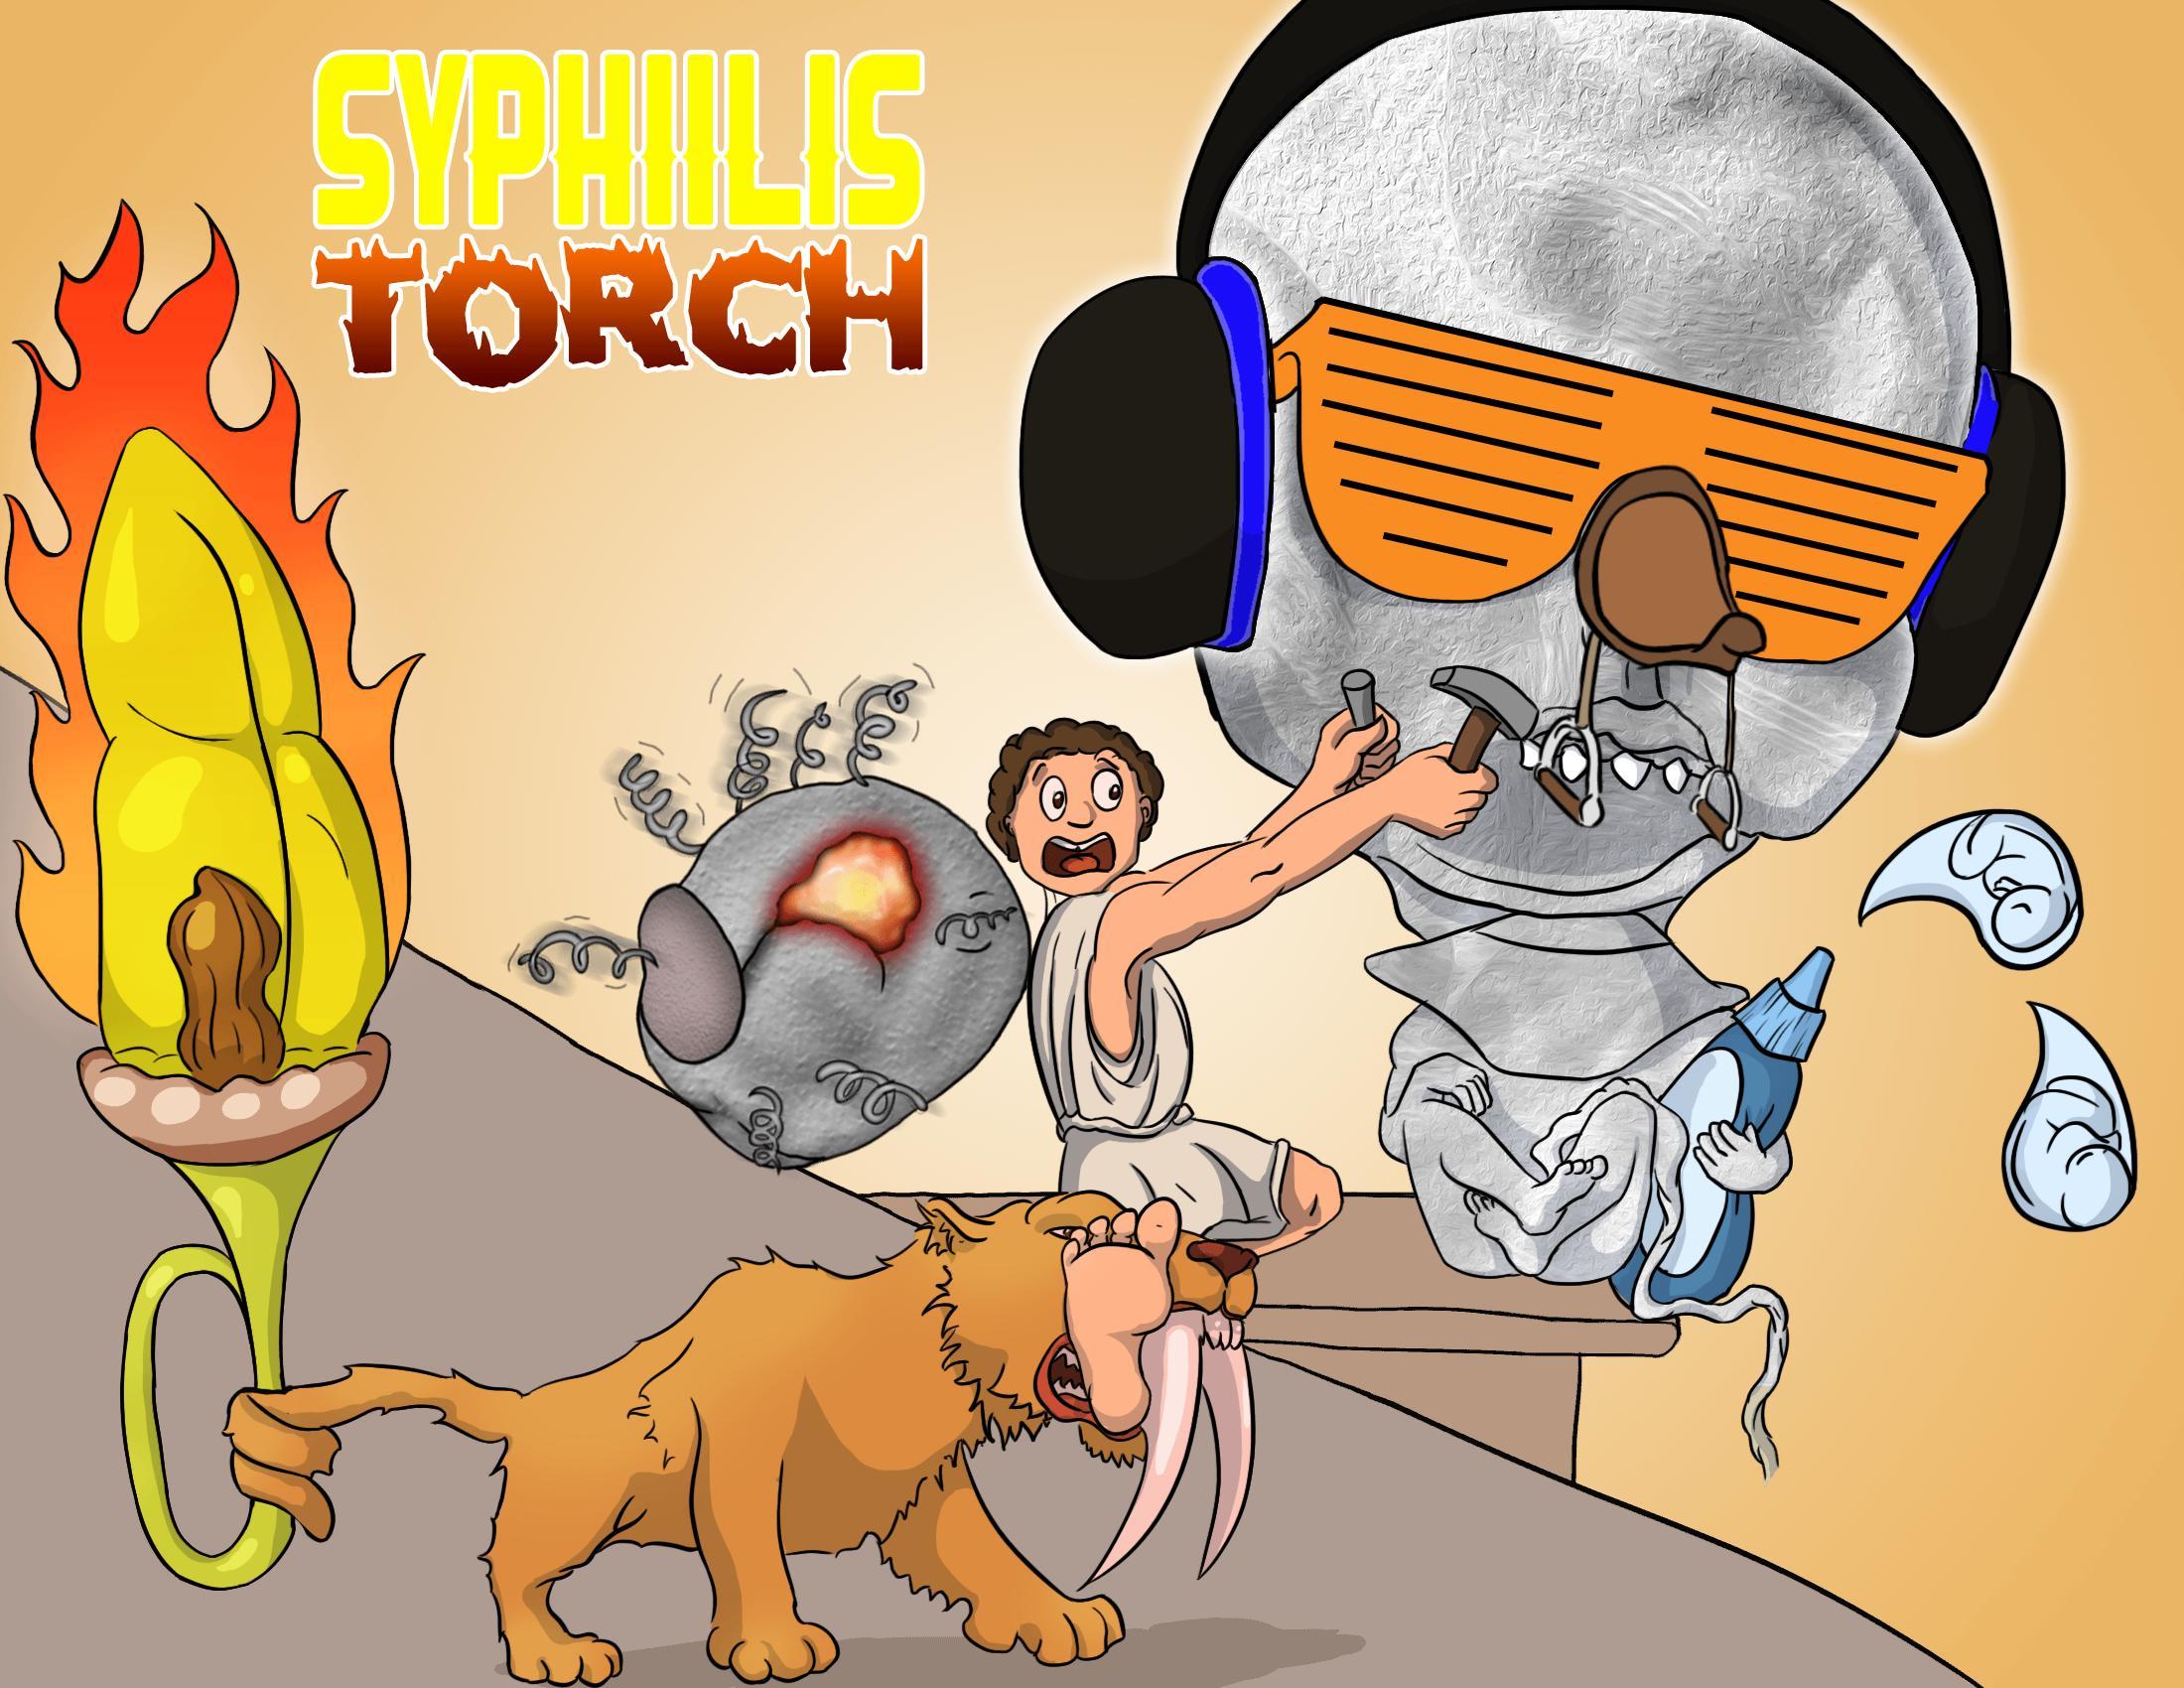 Syphilis TORCH